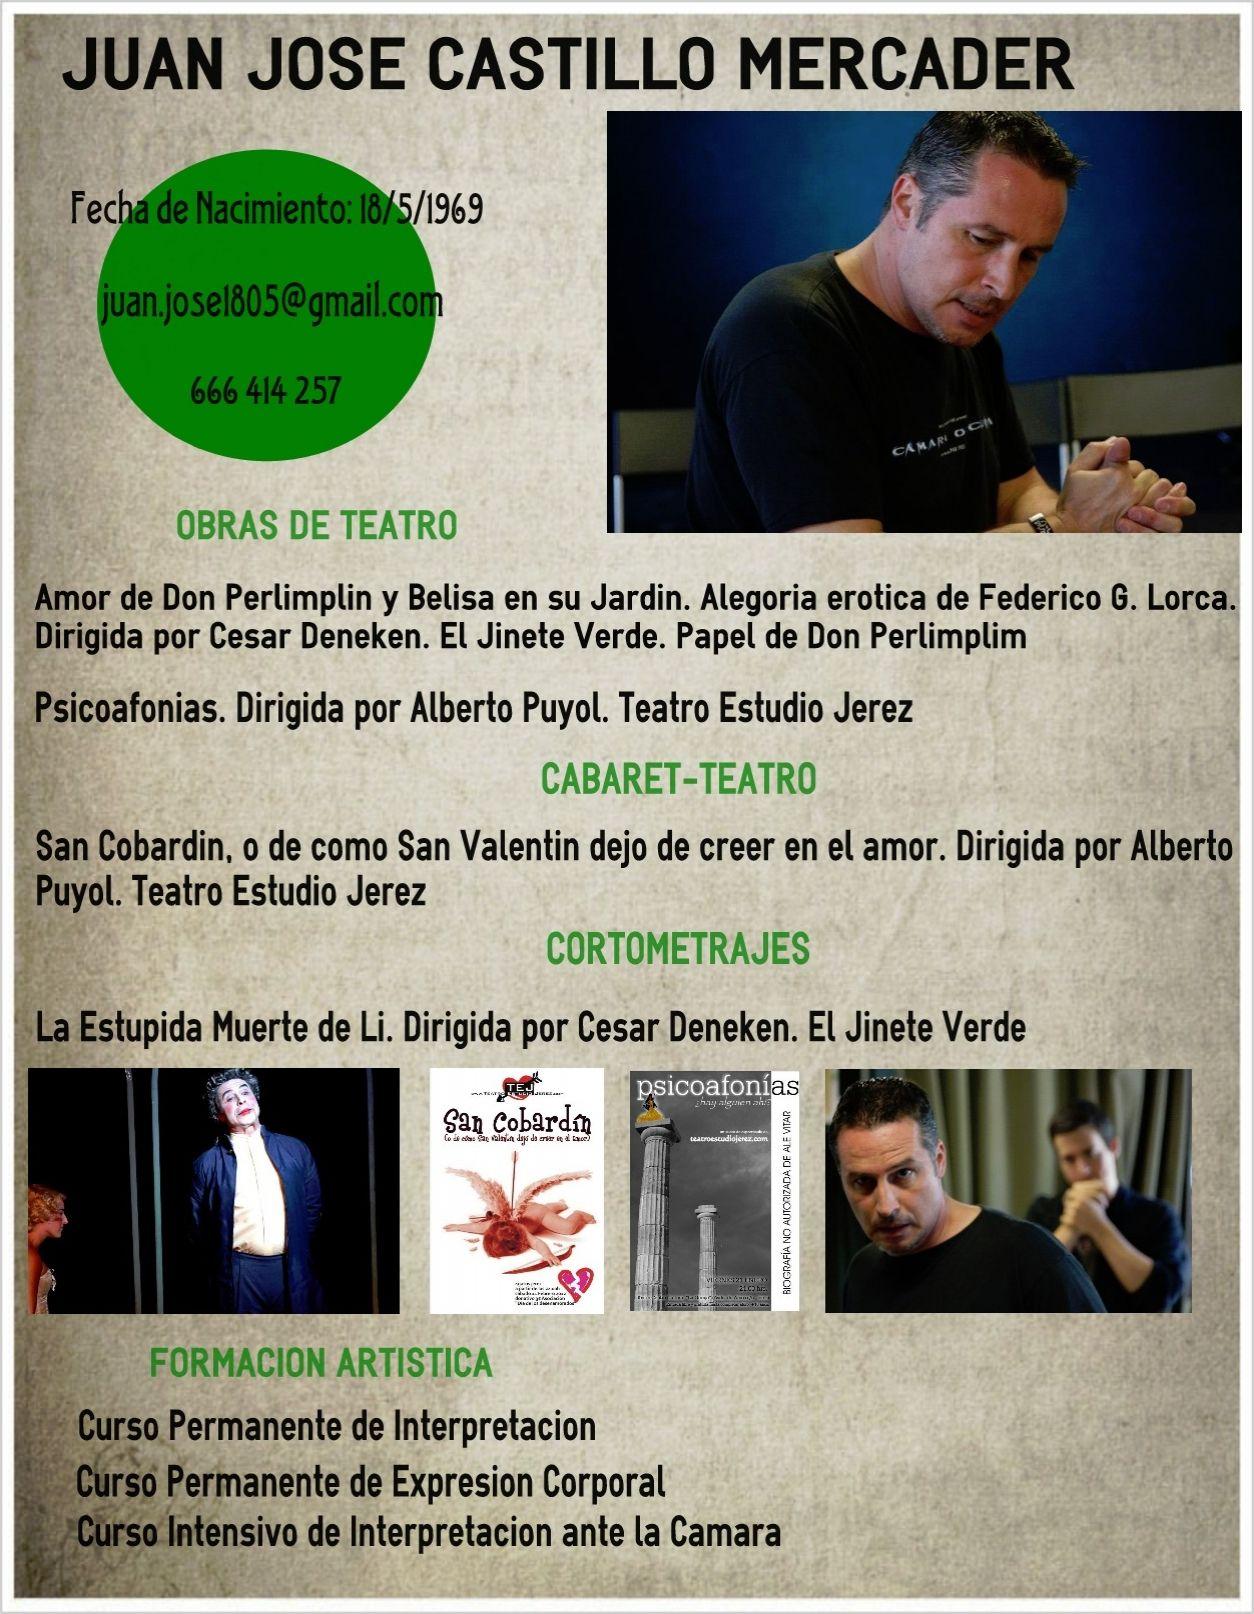 Curriculum #actor #infografia | Curricula creativos | Pinterest